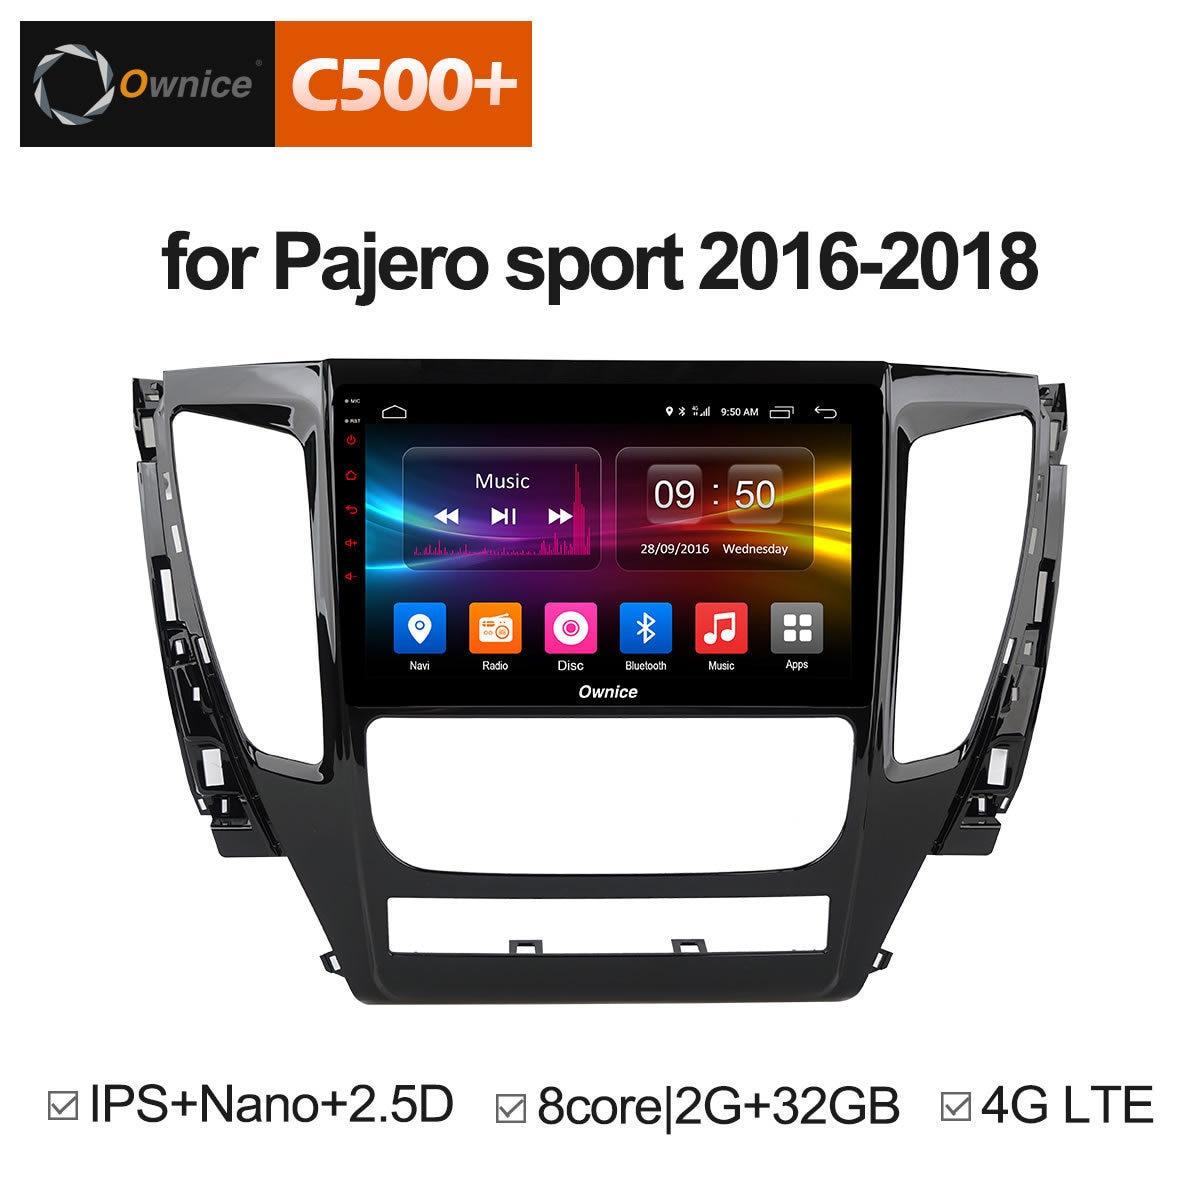 Pour Mitsubishi Pajero Sport 2016 2017 2018 Android 8.1 stéréo véhicule DAB véhicule multimédia 2.5D DAB Auto Radio 2 Din GPS IPS